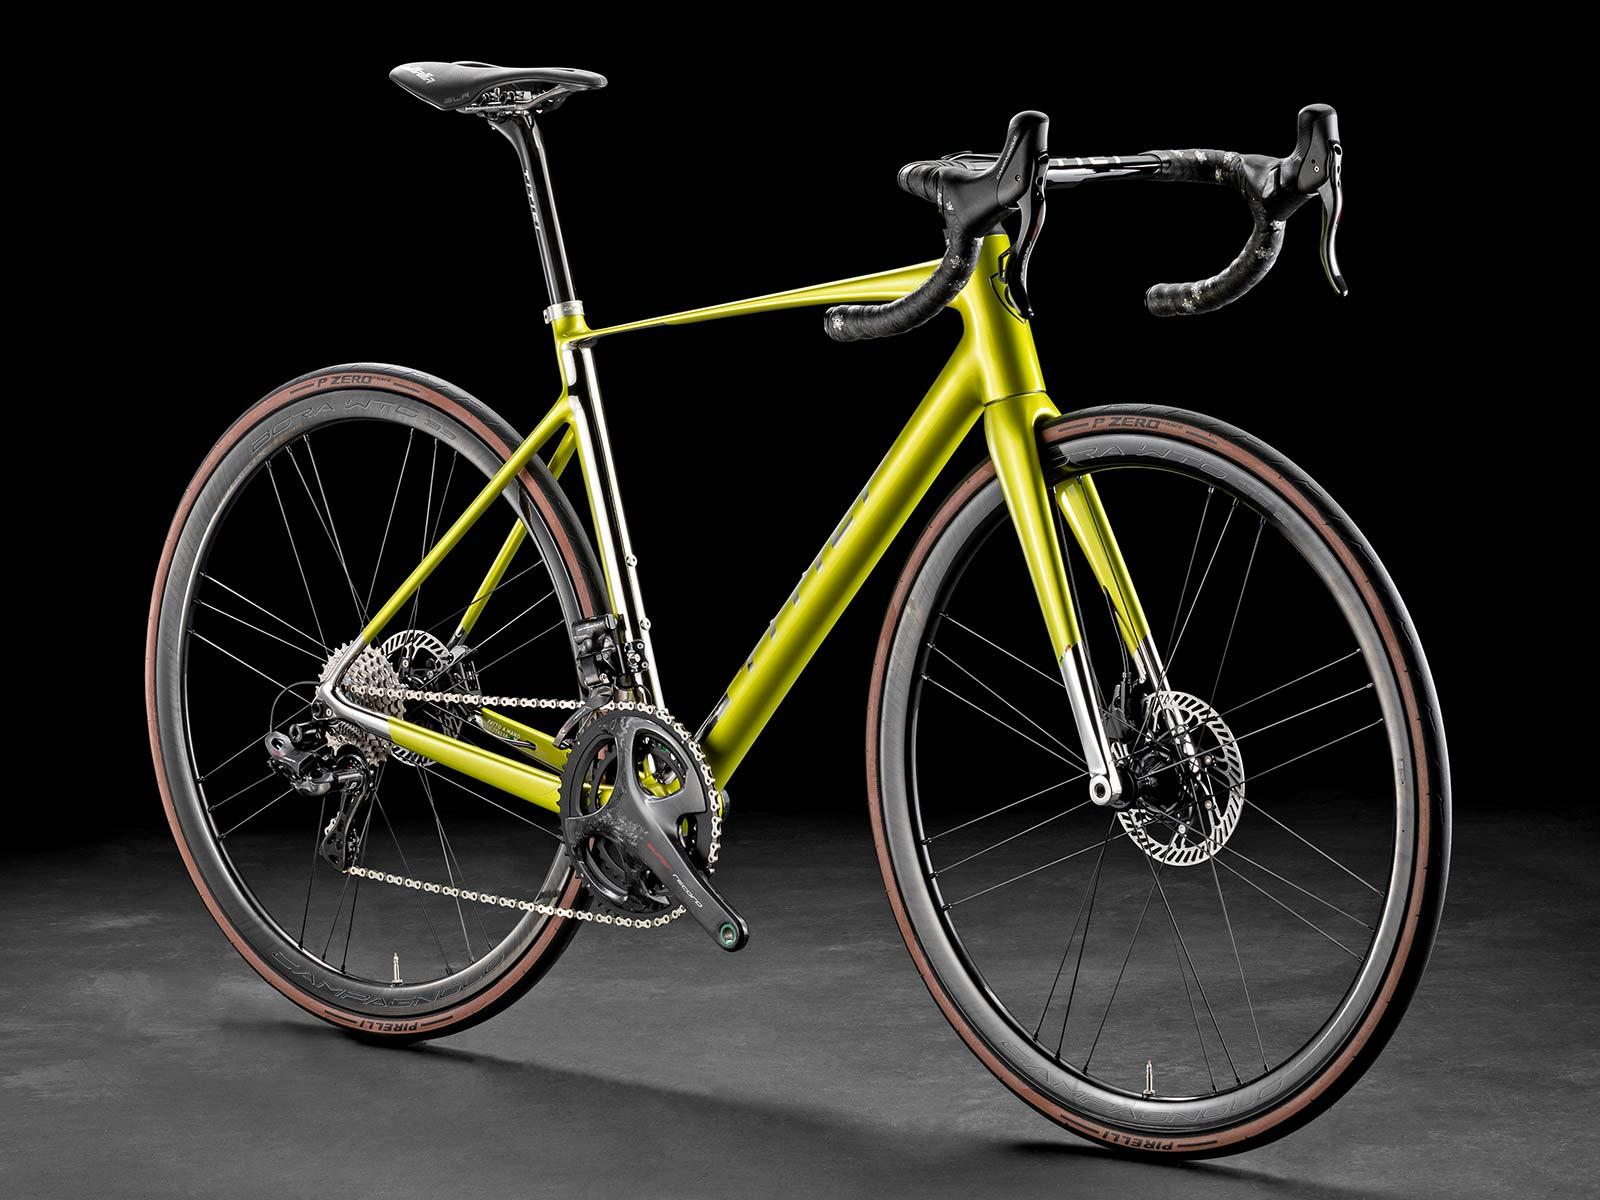 2021 Titici Vento light aero road bike, full-custom fully-integrated lightweight carbon aerodynamic PAT Flexy climbers road bike, studio photo by Pietro Bianchi, angled